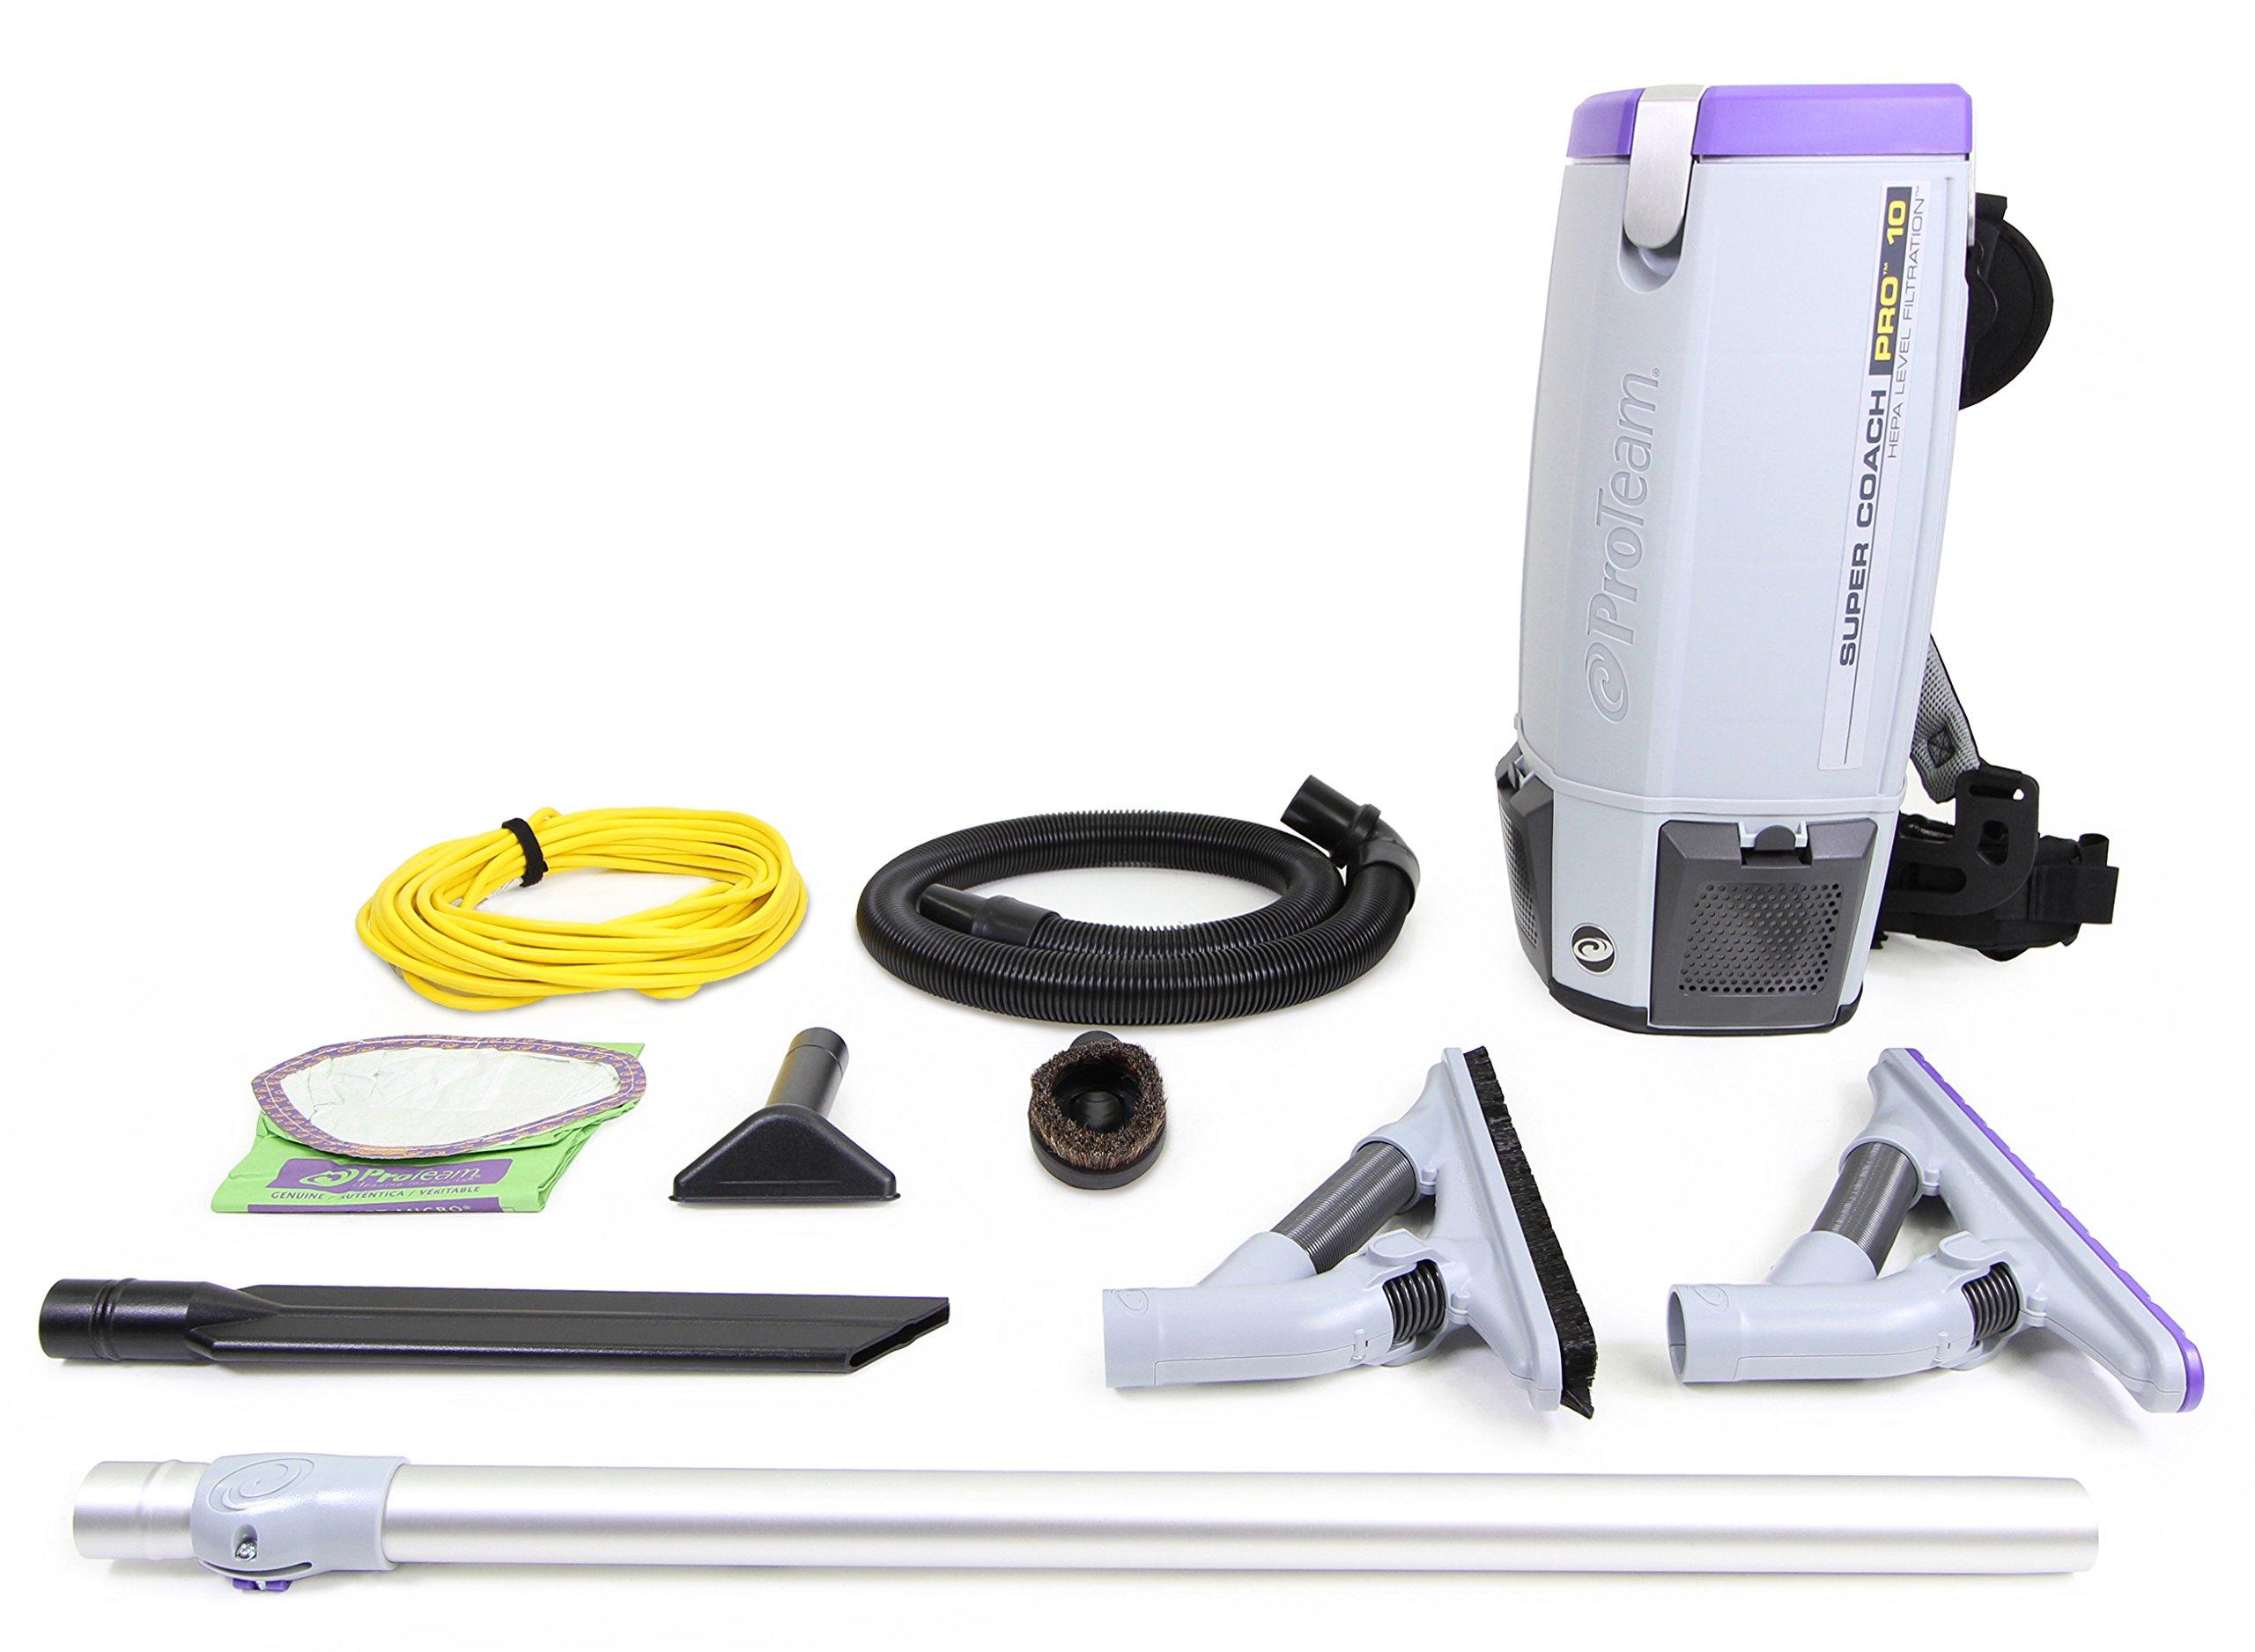 Pro Team Super Coach Pro 10 QT Backpack Vacuum Cleaner